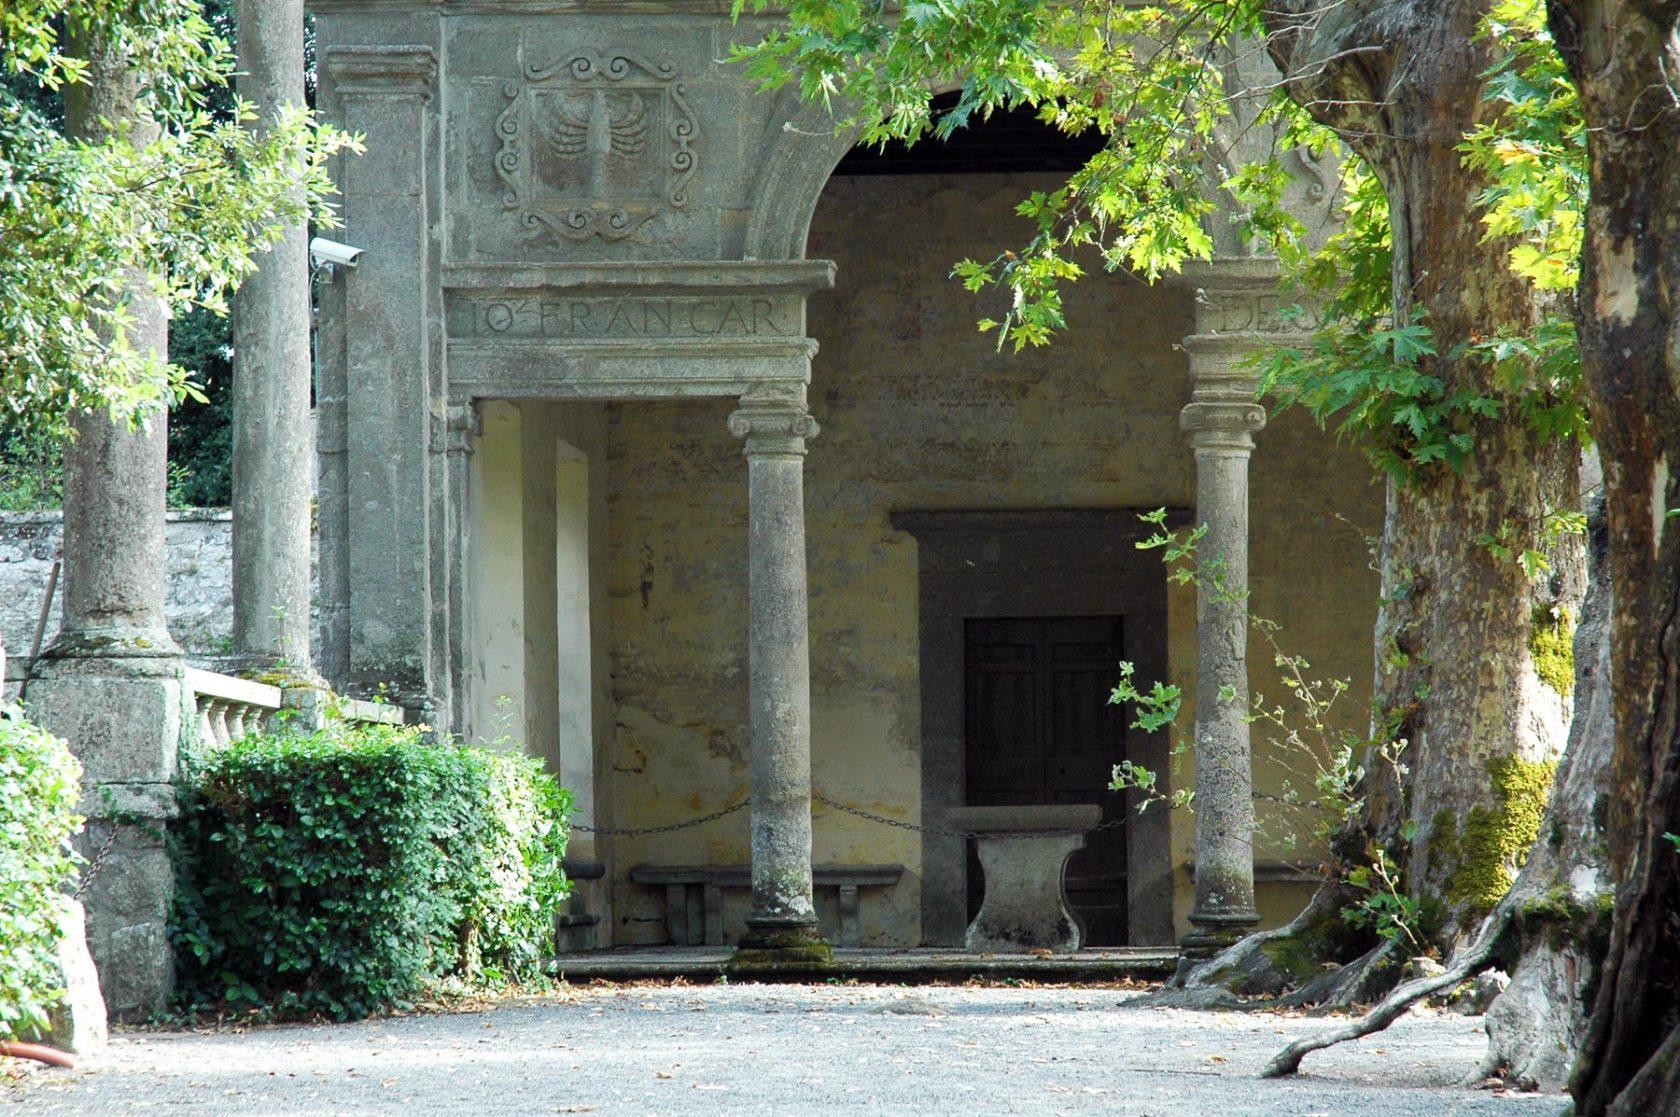 Villa Lante, Lazio